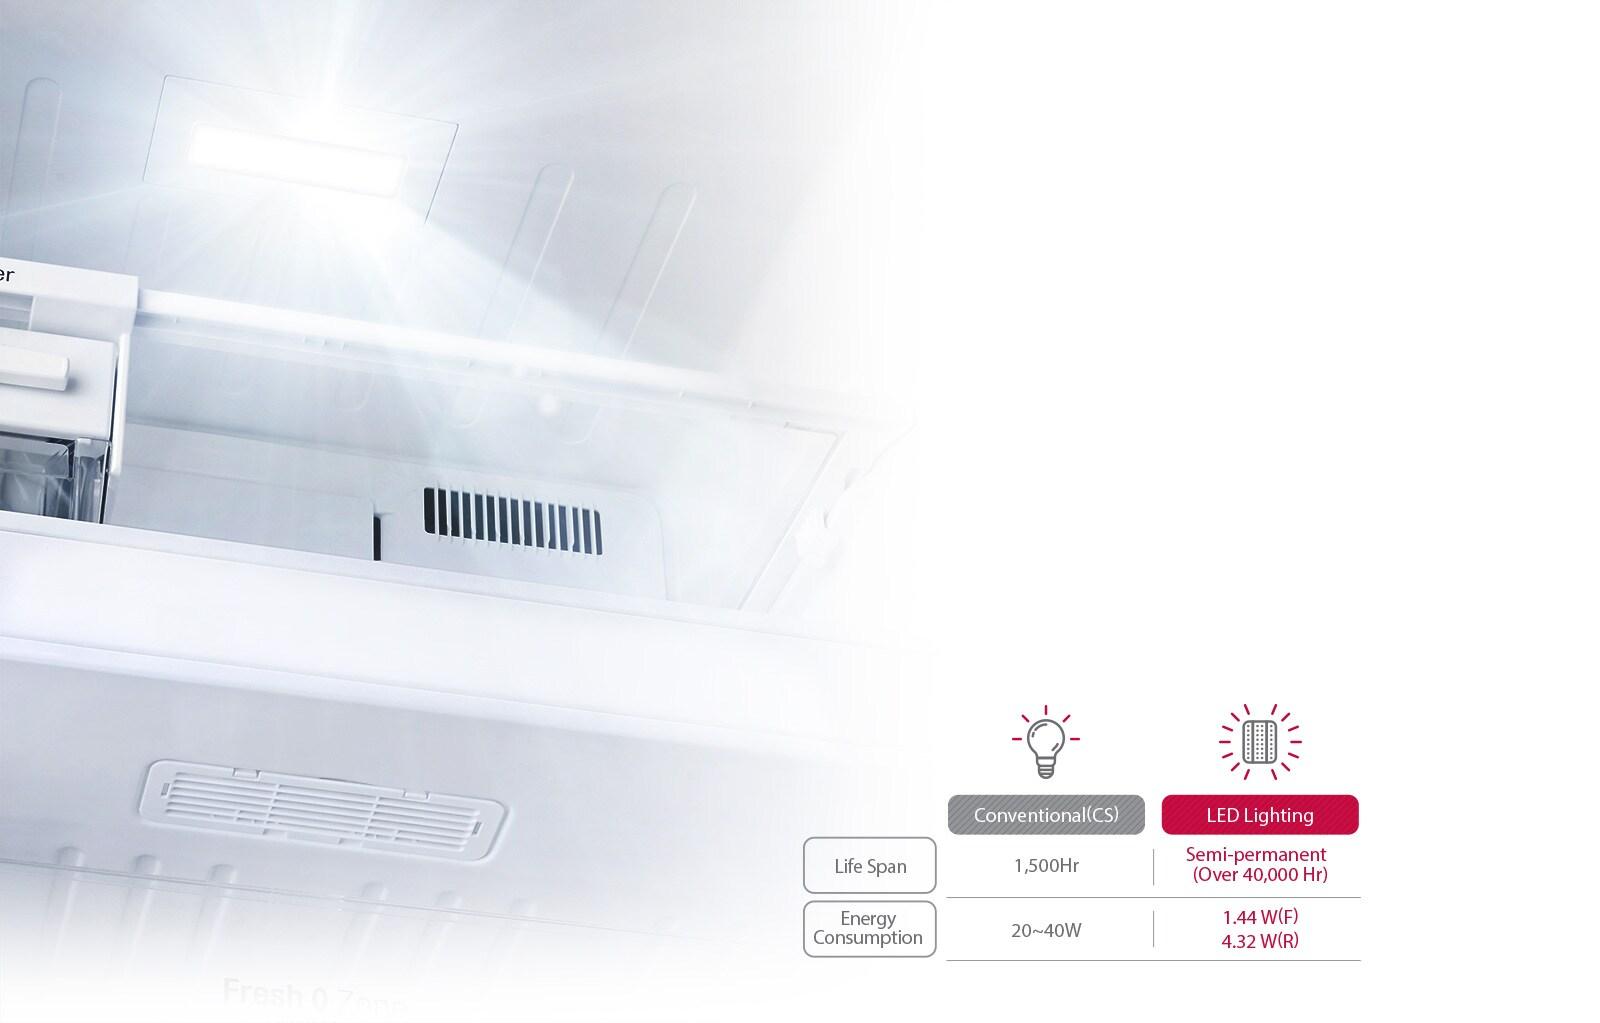 LG GL-T372JDSY 335 Ltr LED Lighting